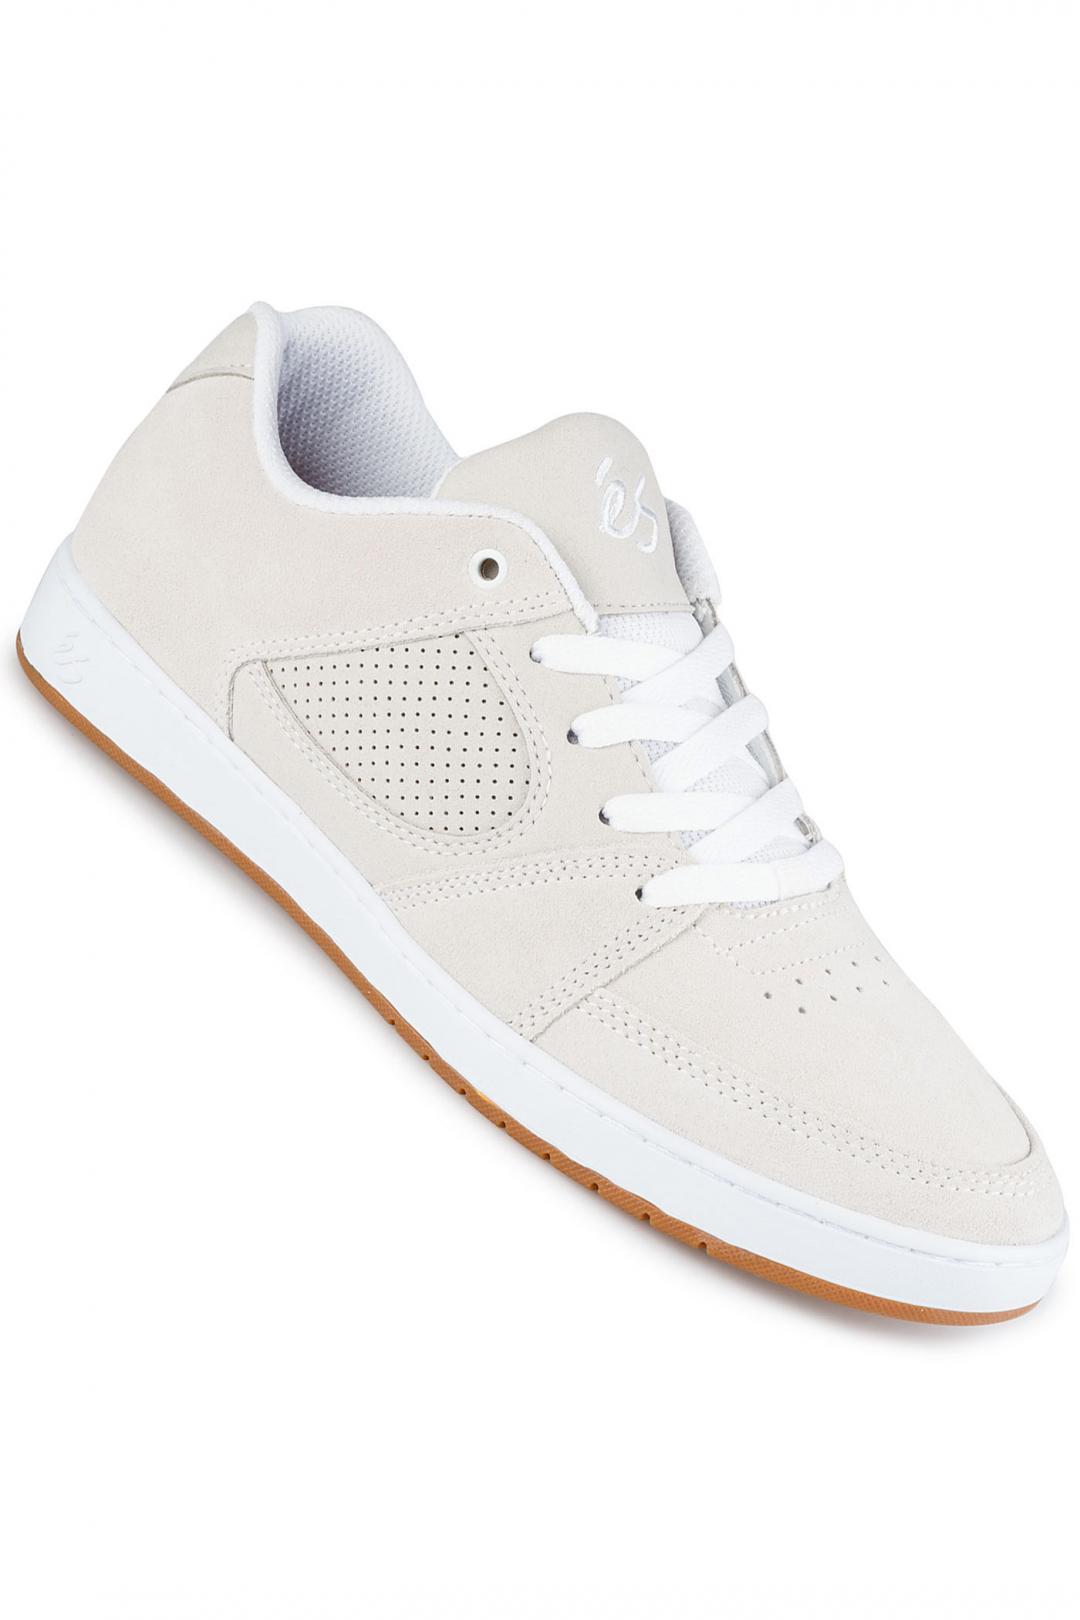 Uomo éS Accel Slim white white gum   Sneaker